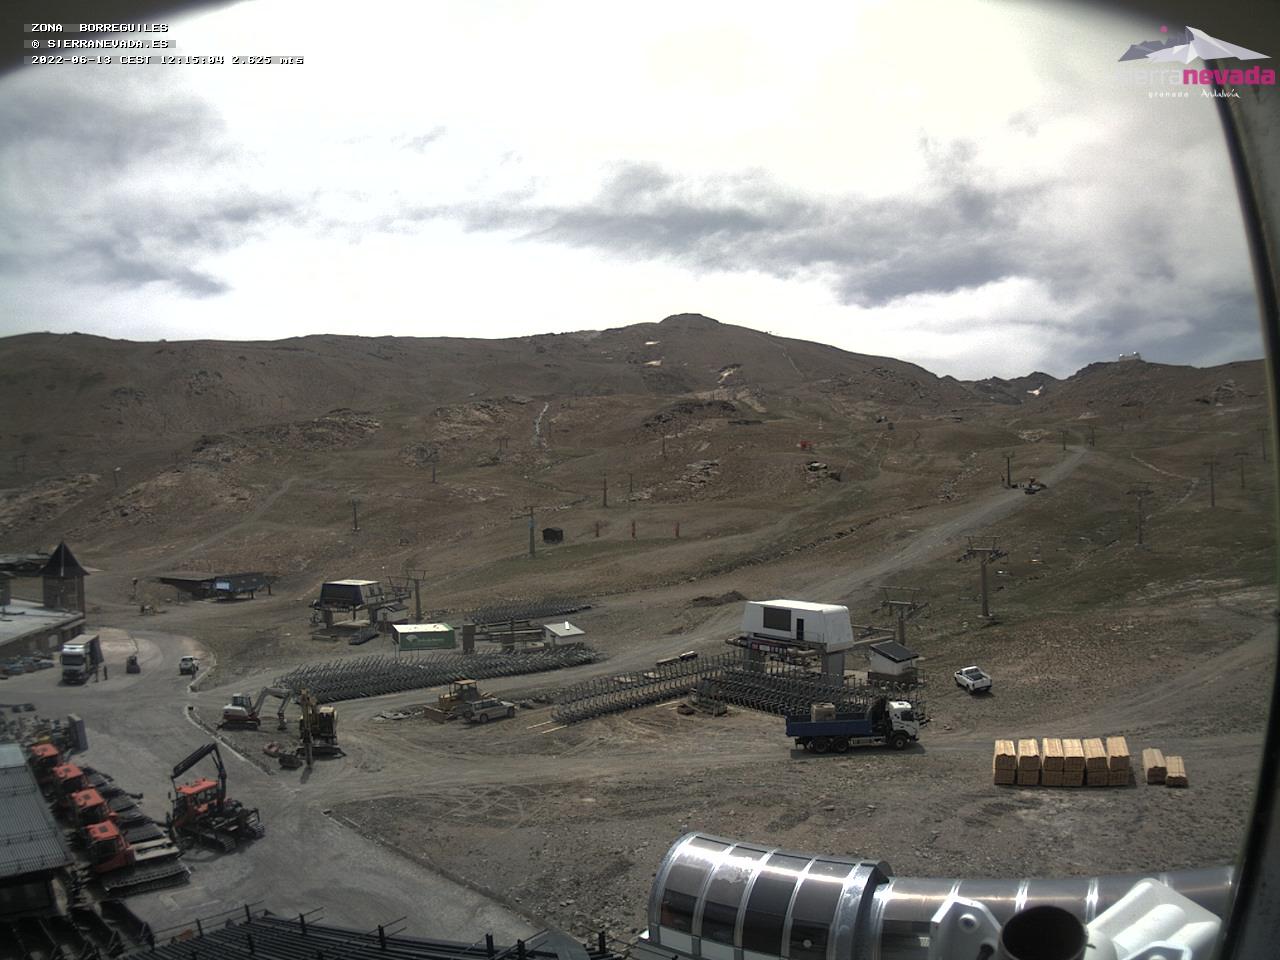 LIVE Webcam in Borreguiles - Sierra Nevada - Granada